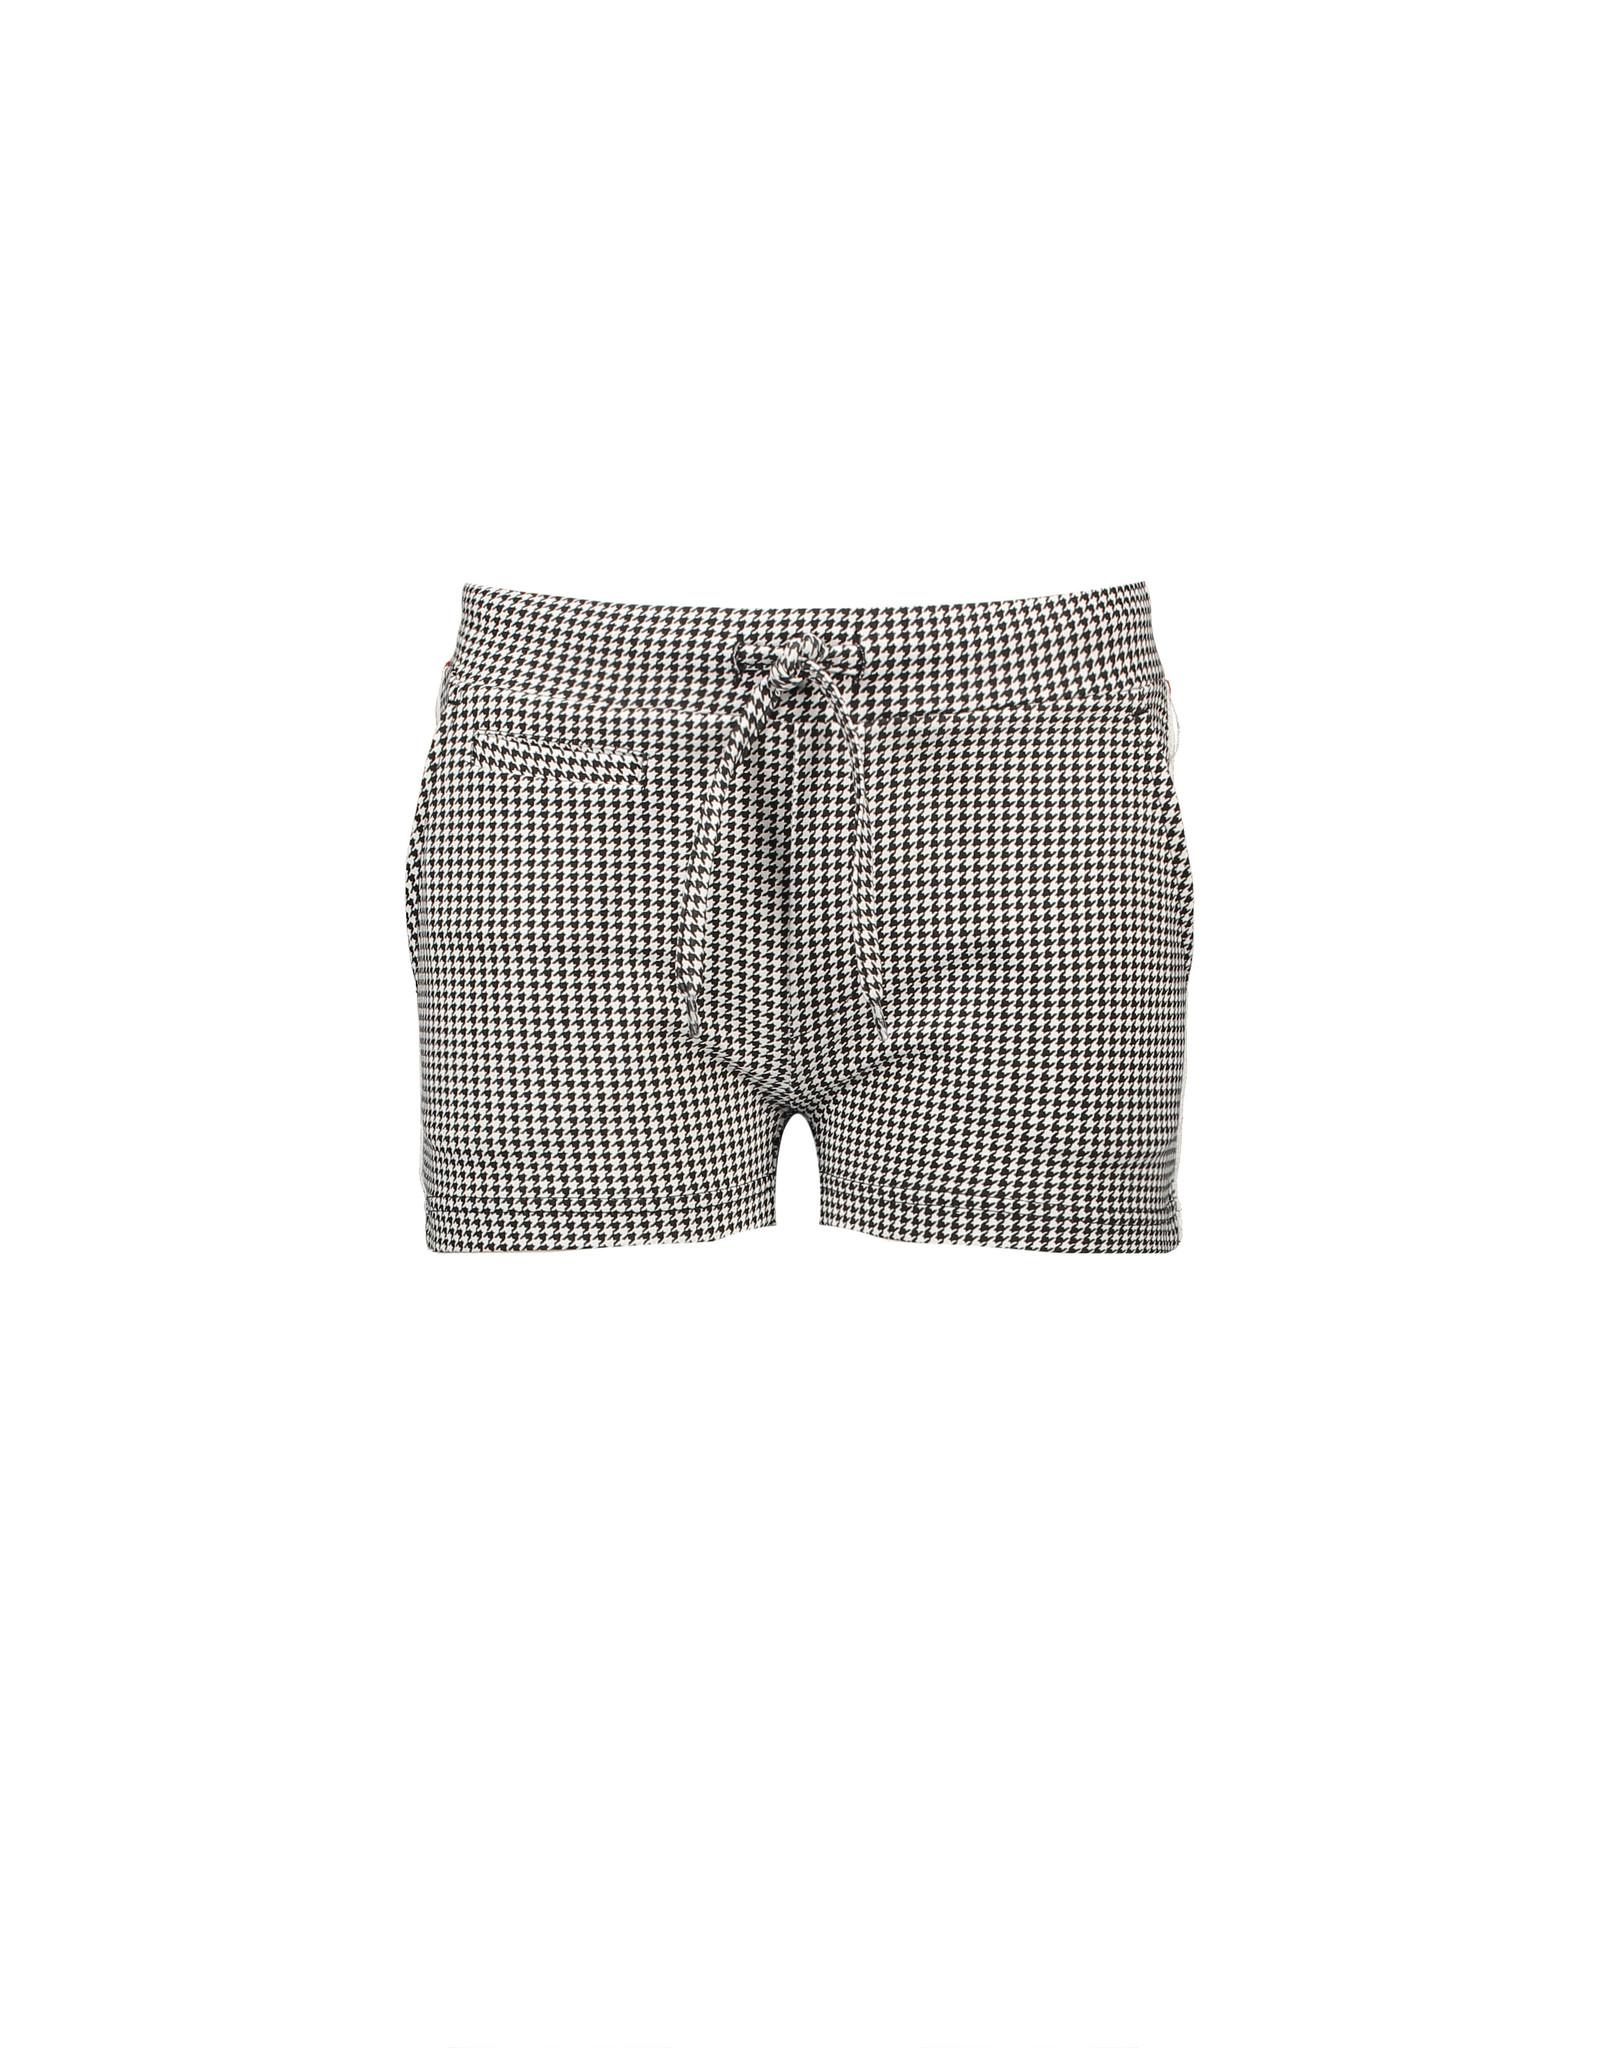 NoBell NoBell ShortyB Short Pants in all over print Pied de Poule JET BLACK